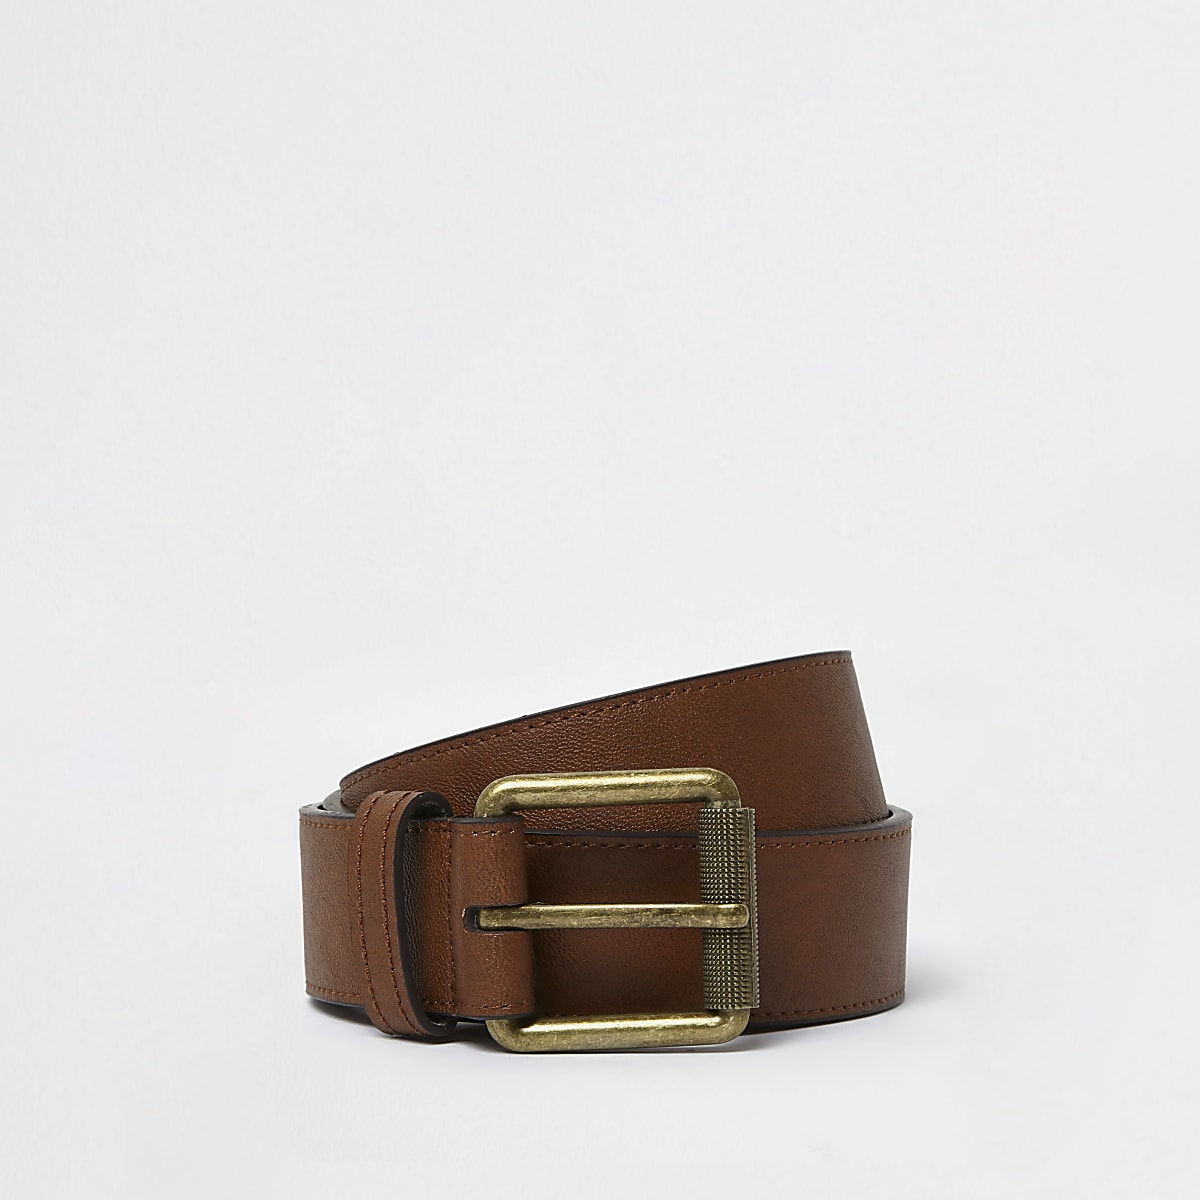 Tan brown square buckle jeans belt